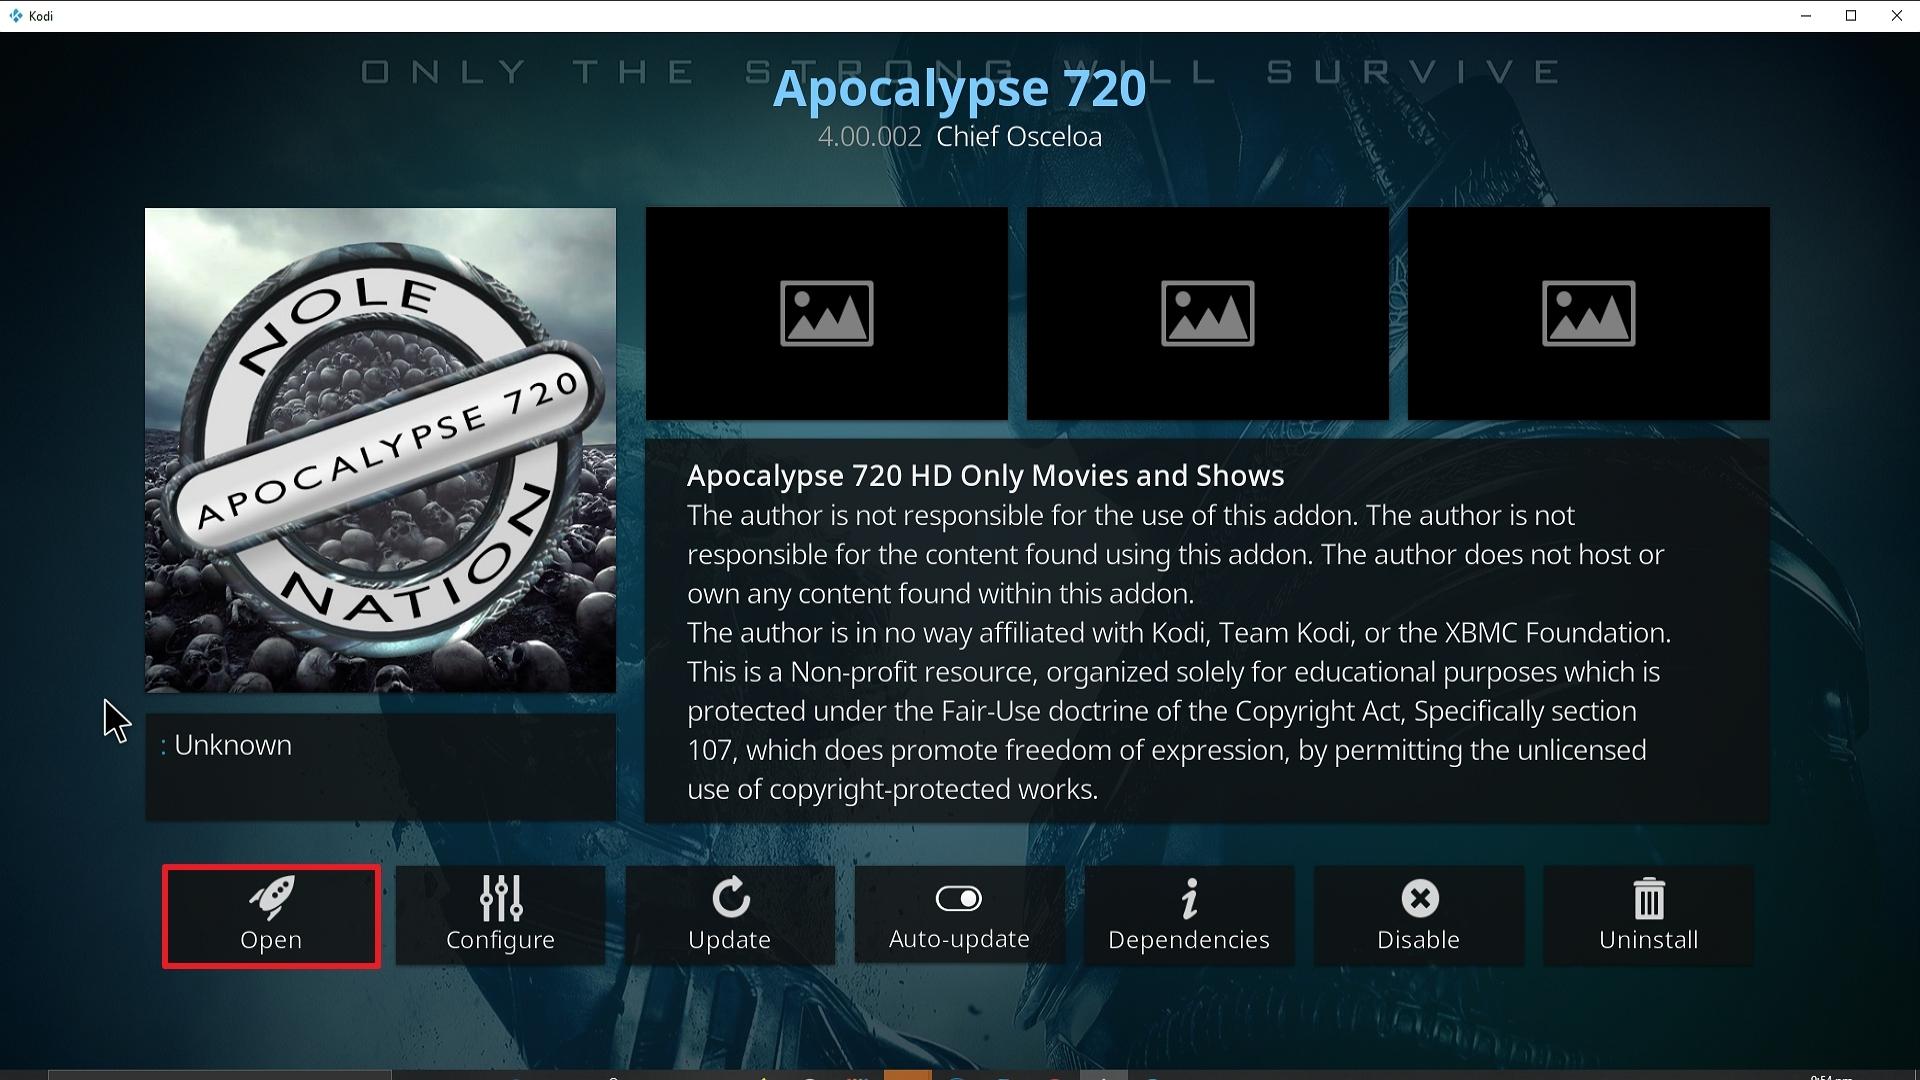 Step 26 Installing Apocalypse 720 addon on Kodi